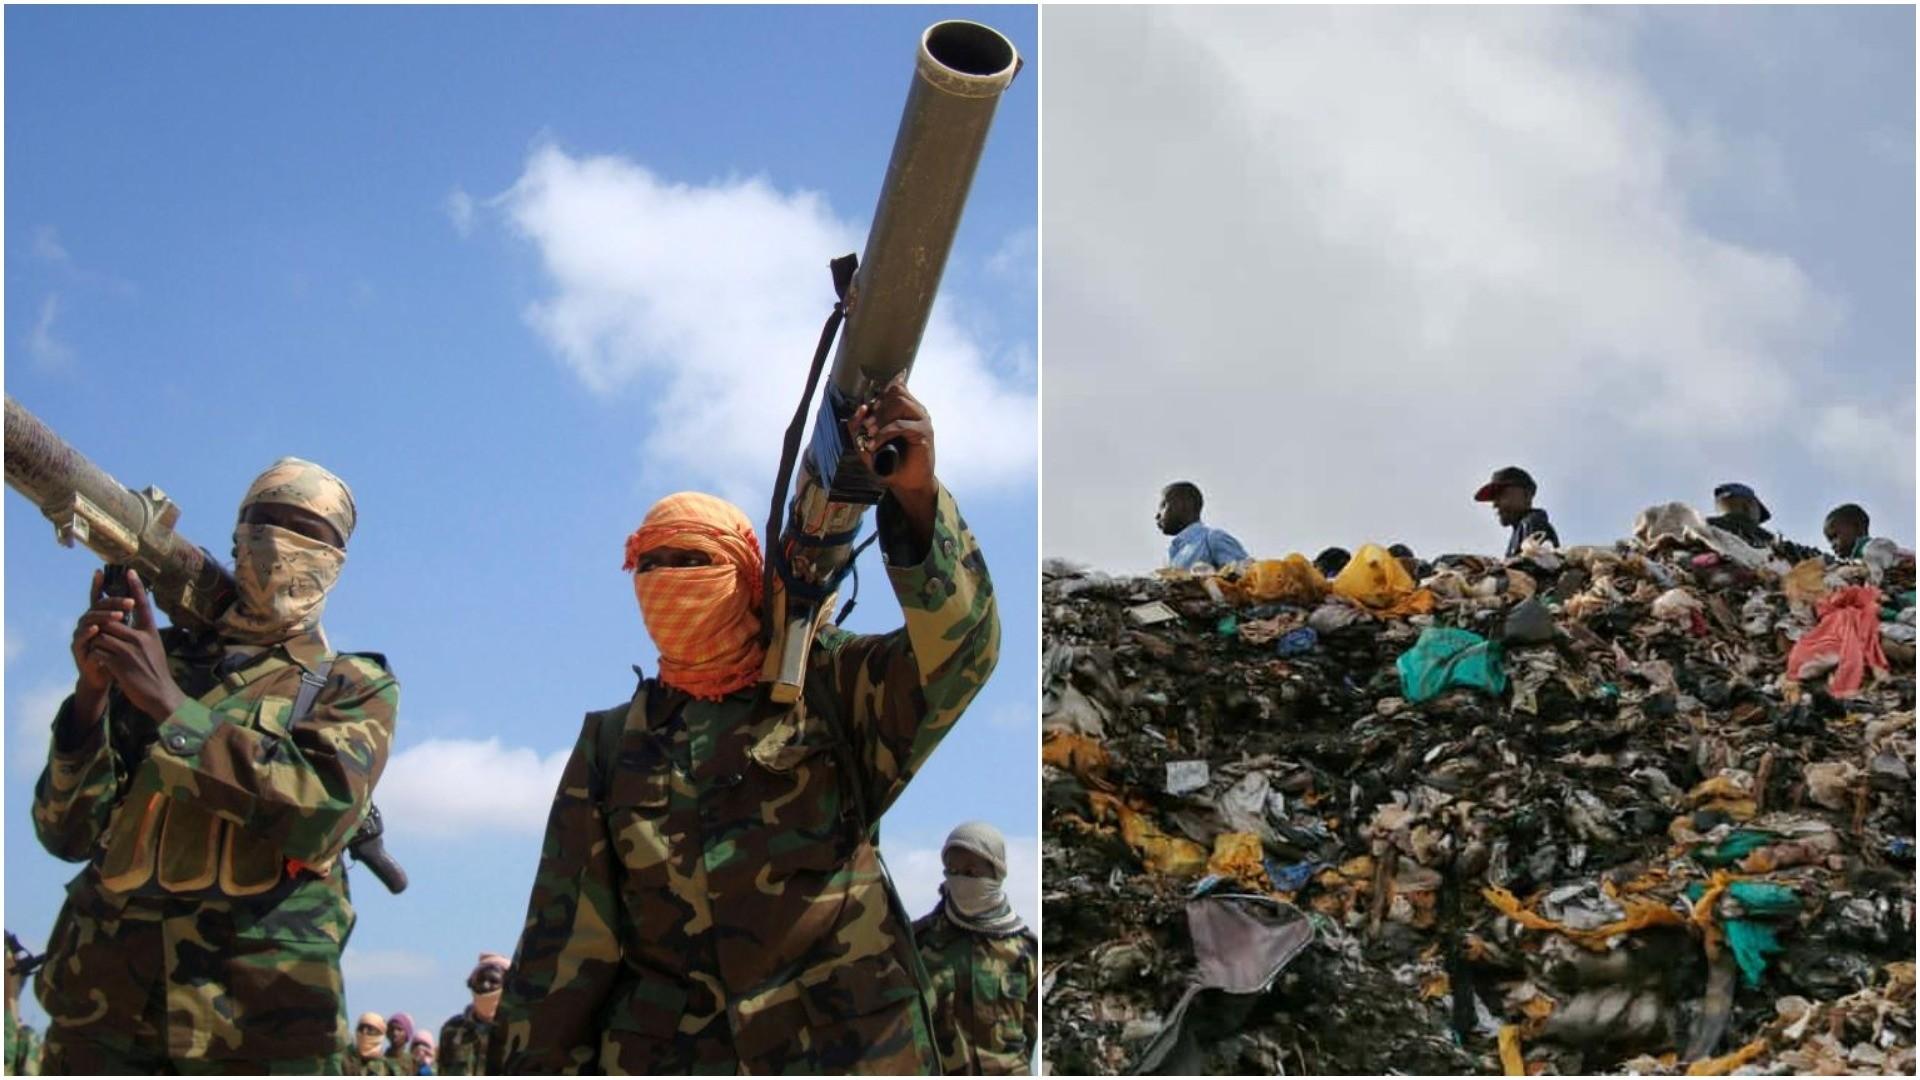 Members of Somalia's al-Qaida linked al-Shabab militia hold their weapons in Mogadishu Jan. 1, 2010. (REUTERS) / Plastic bags in Kenya. (EPA)